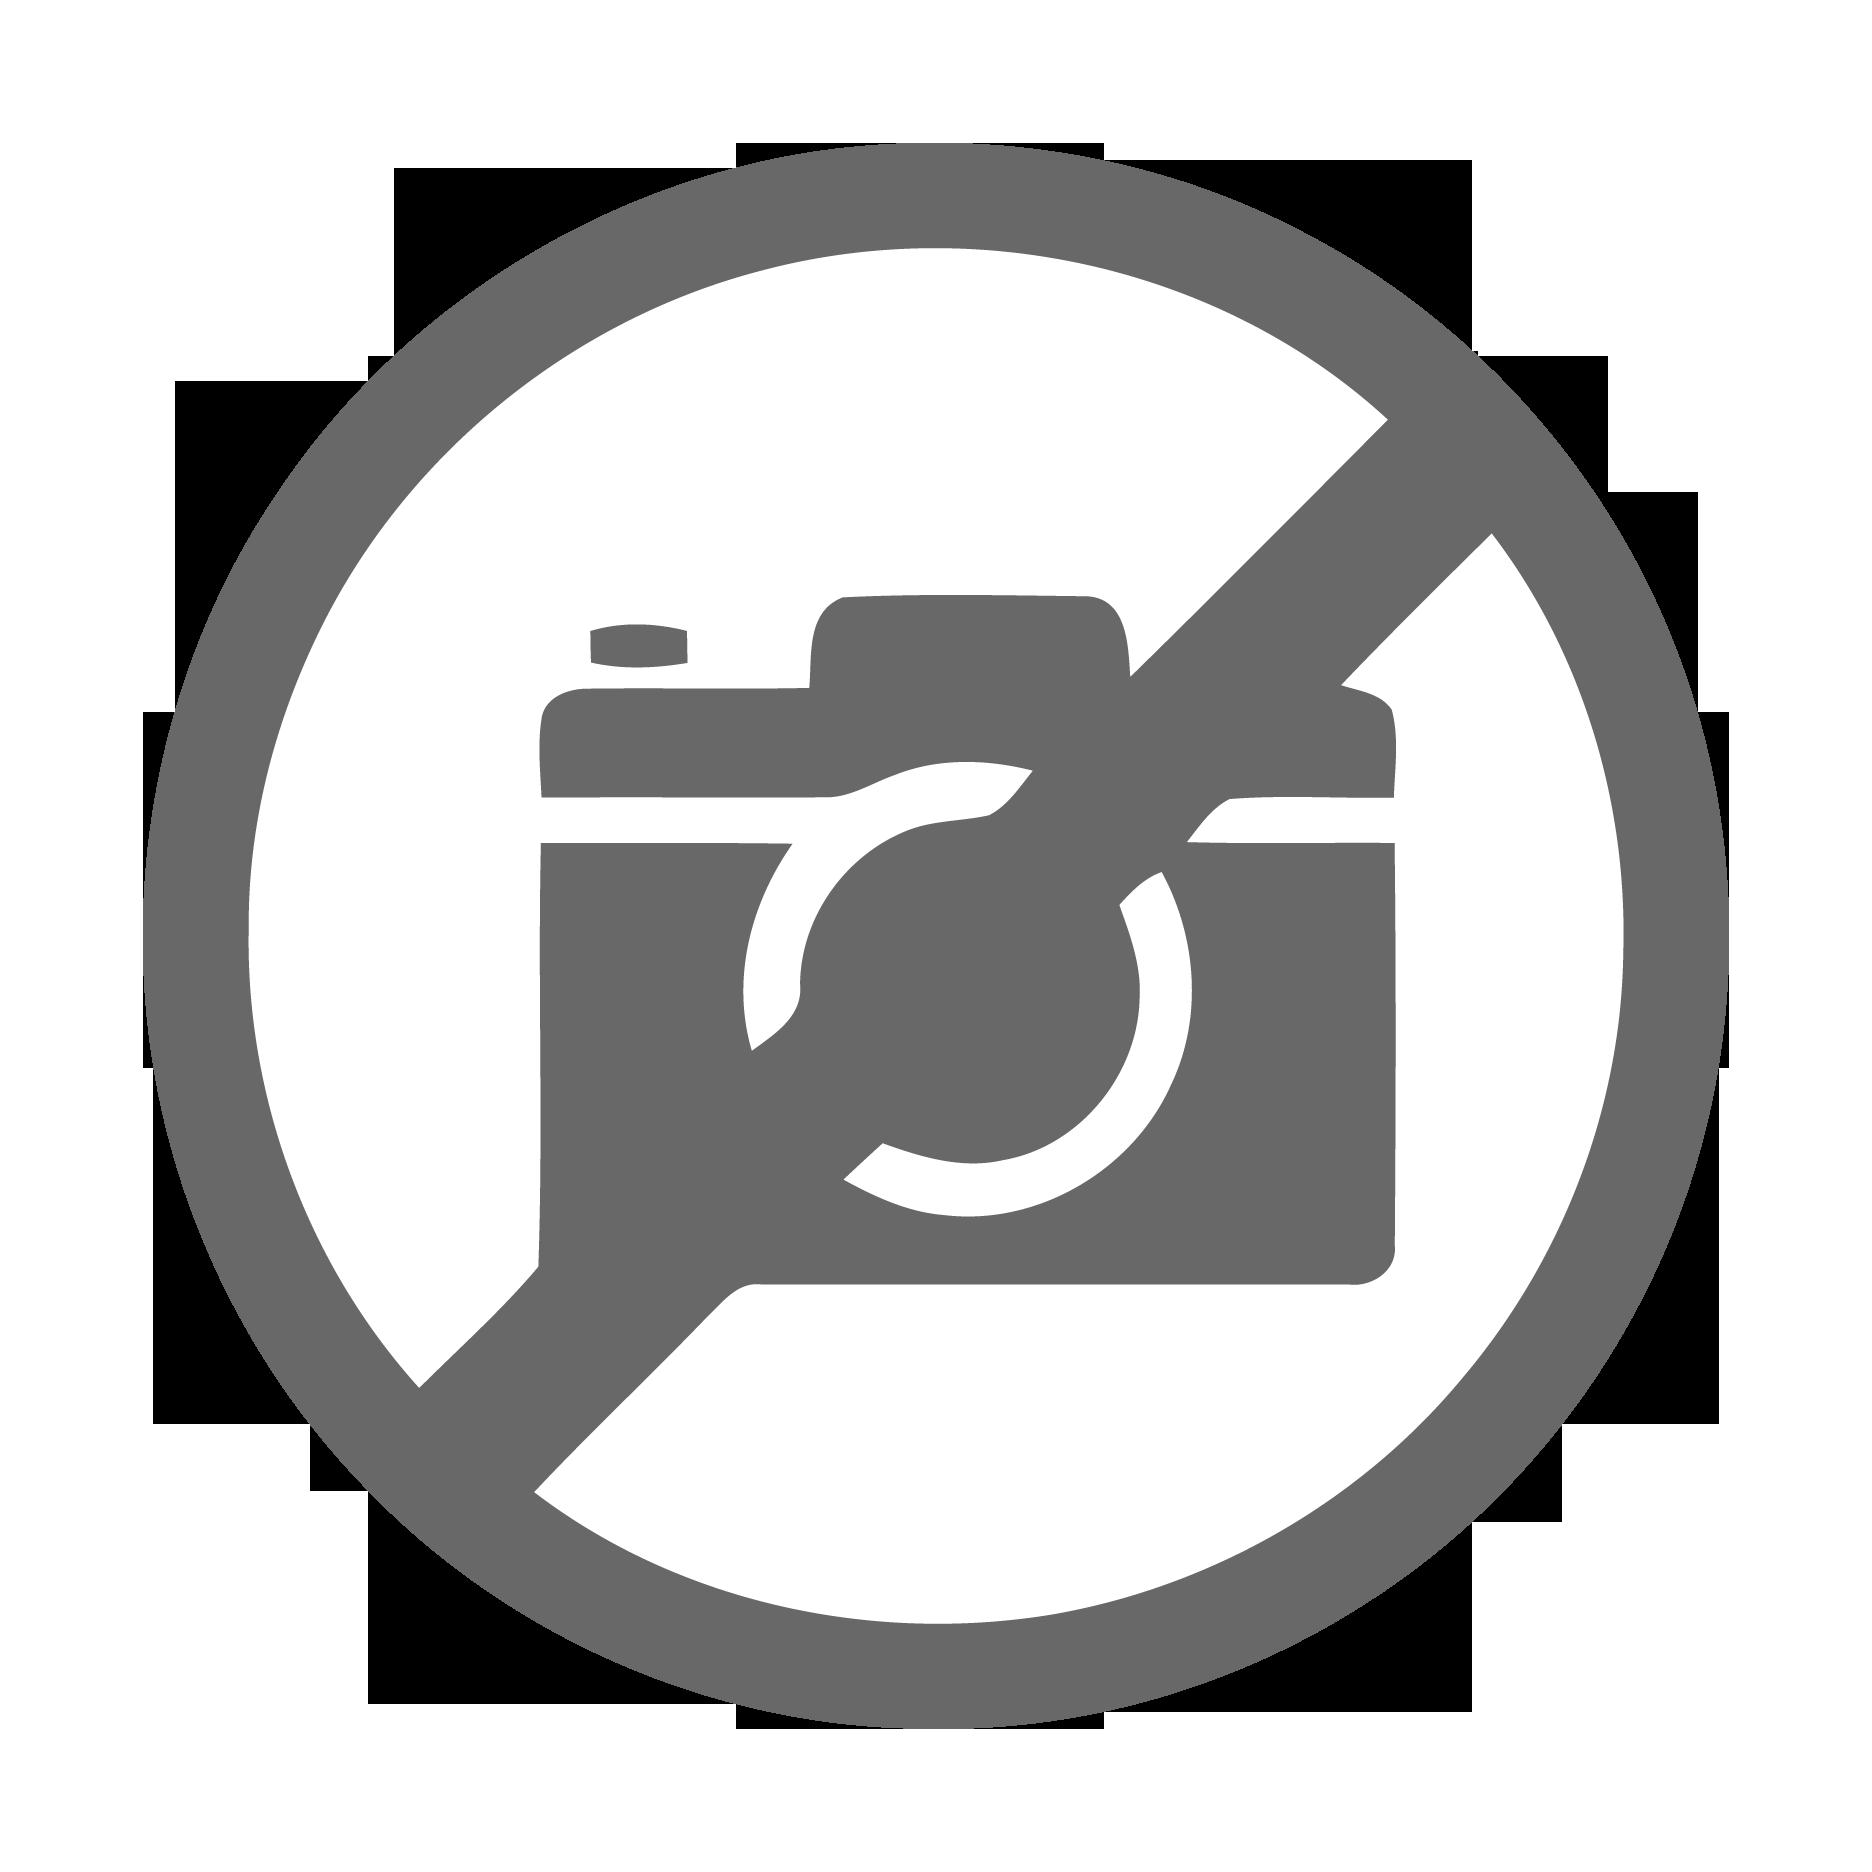 Tililey